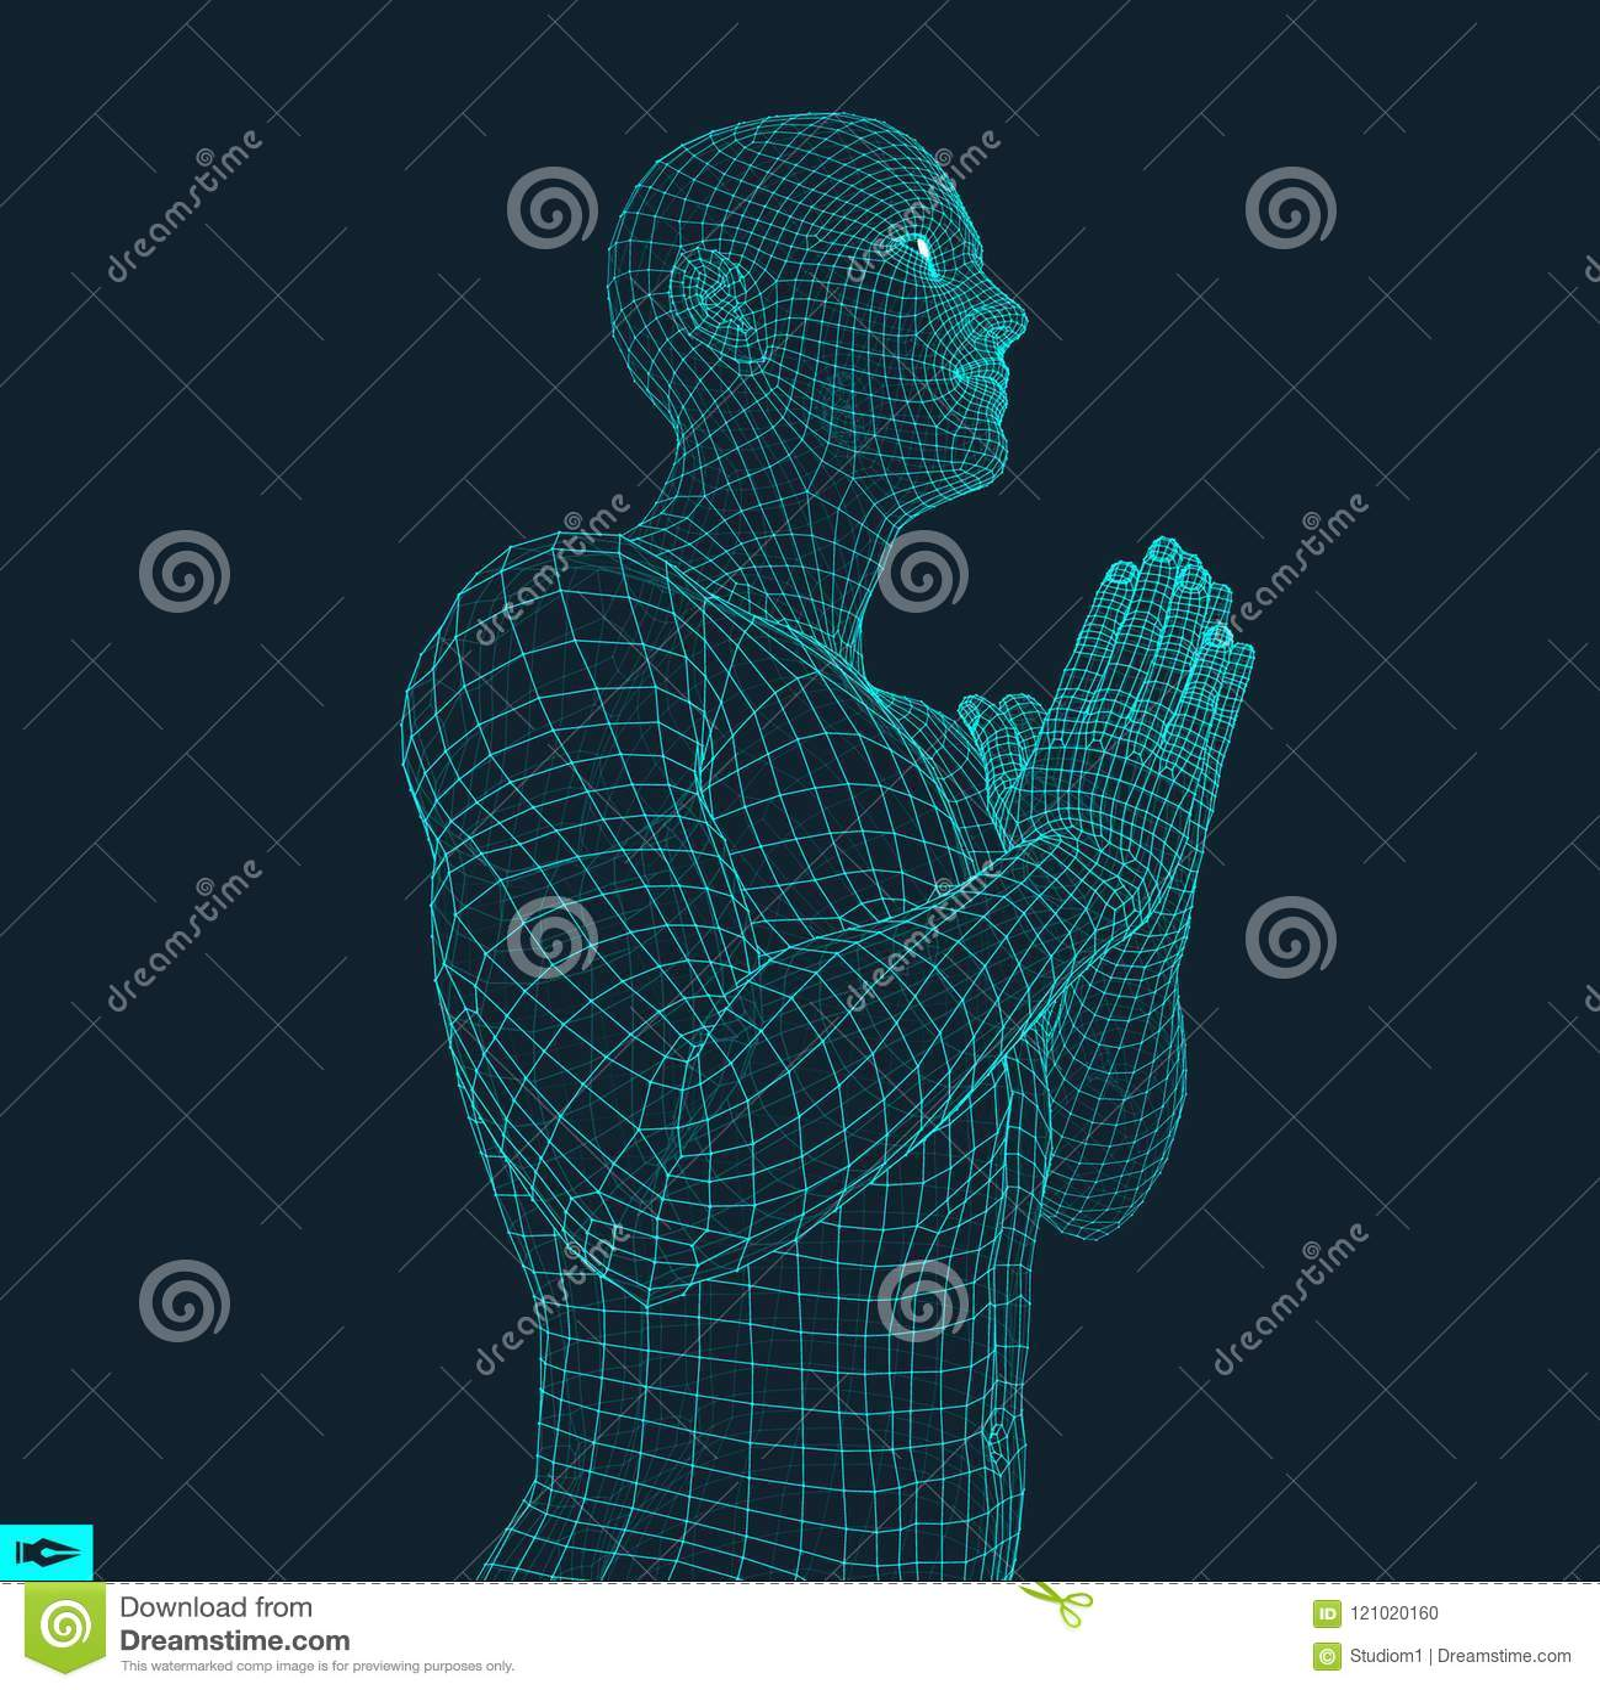 3D Model Of Man  Man Who Prays  Concept For Religion